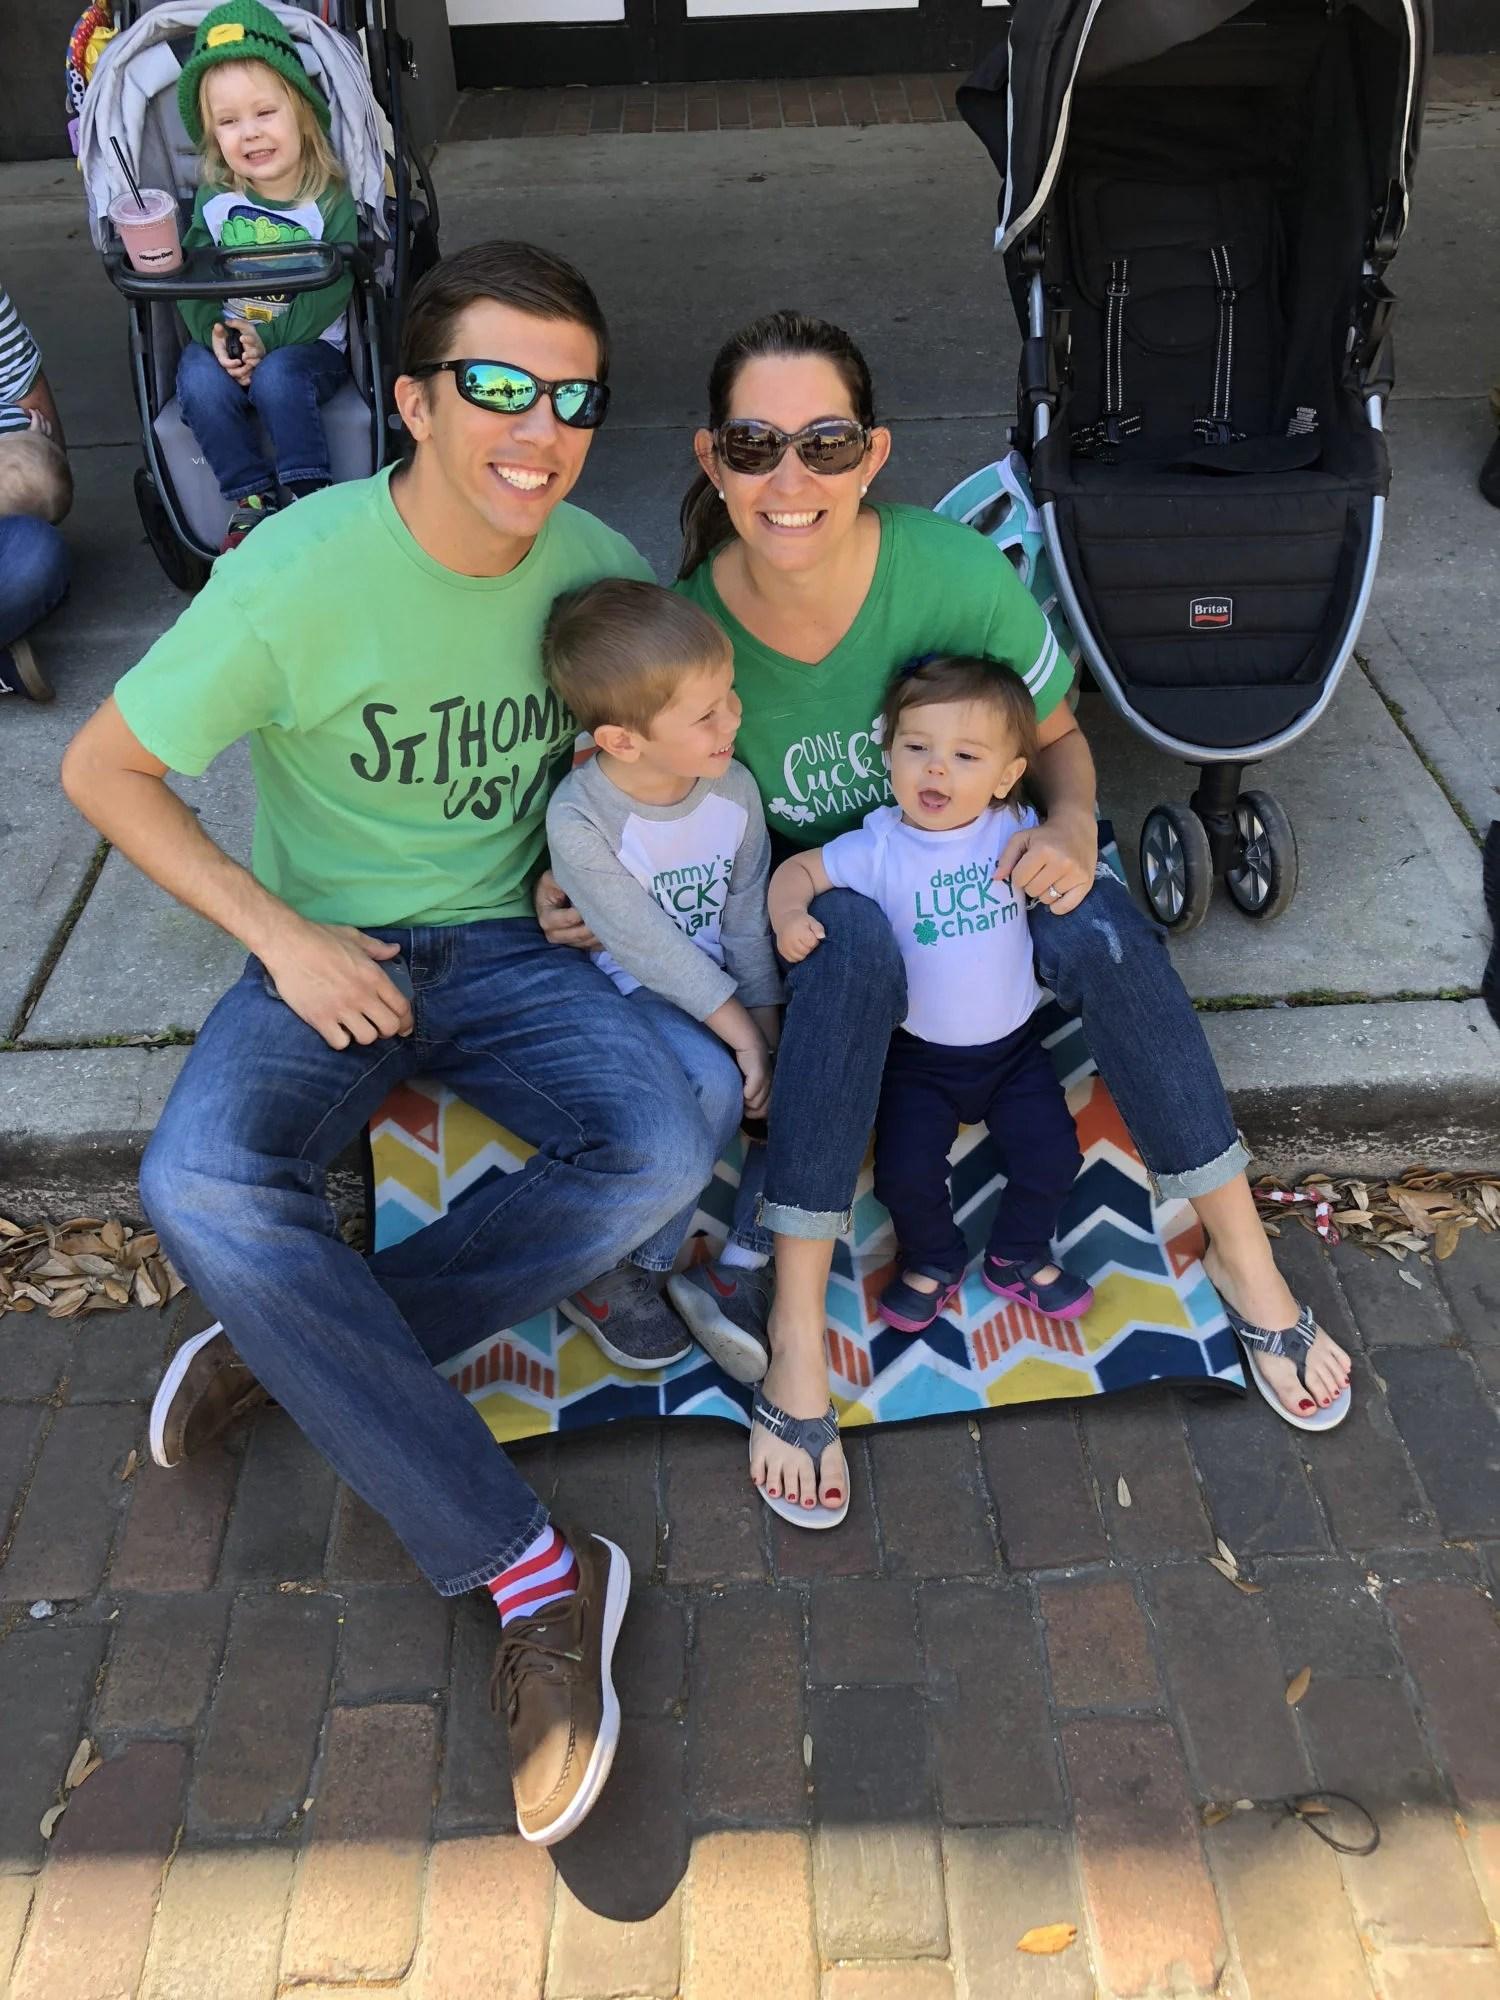 St. Patricks Day parade shirts